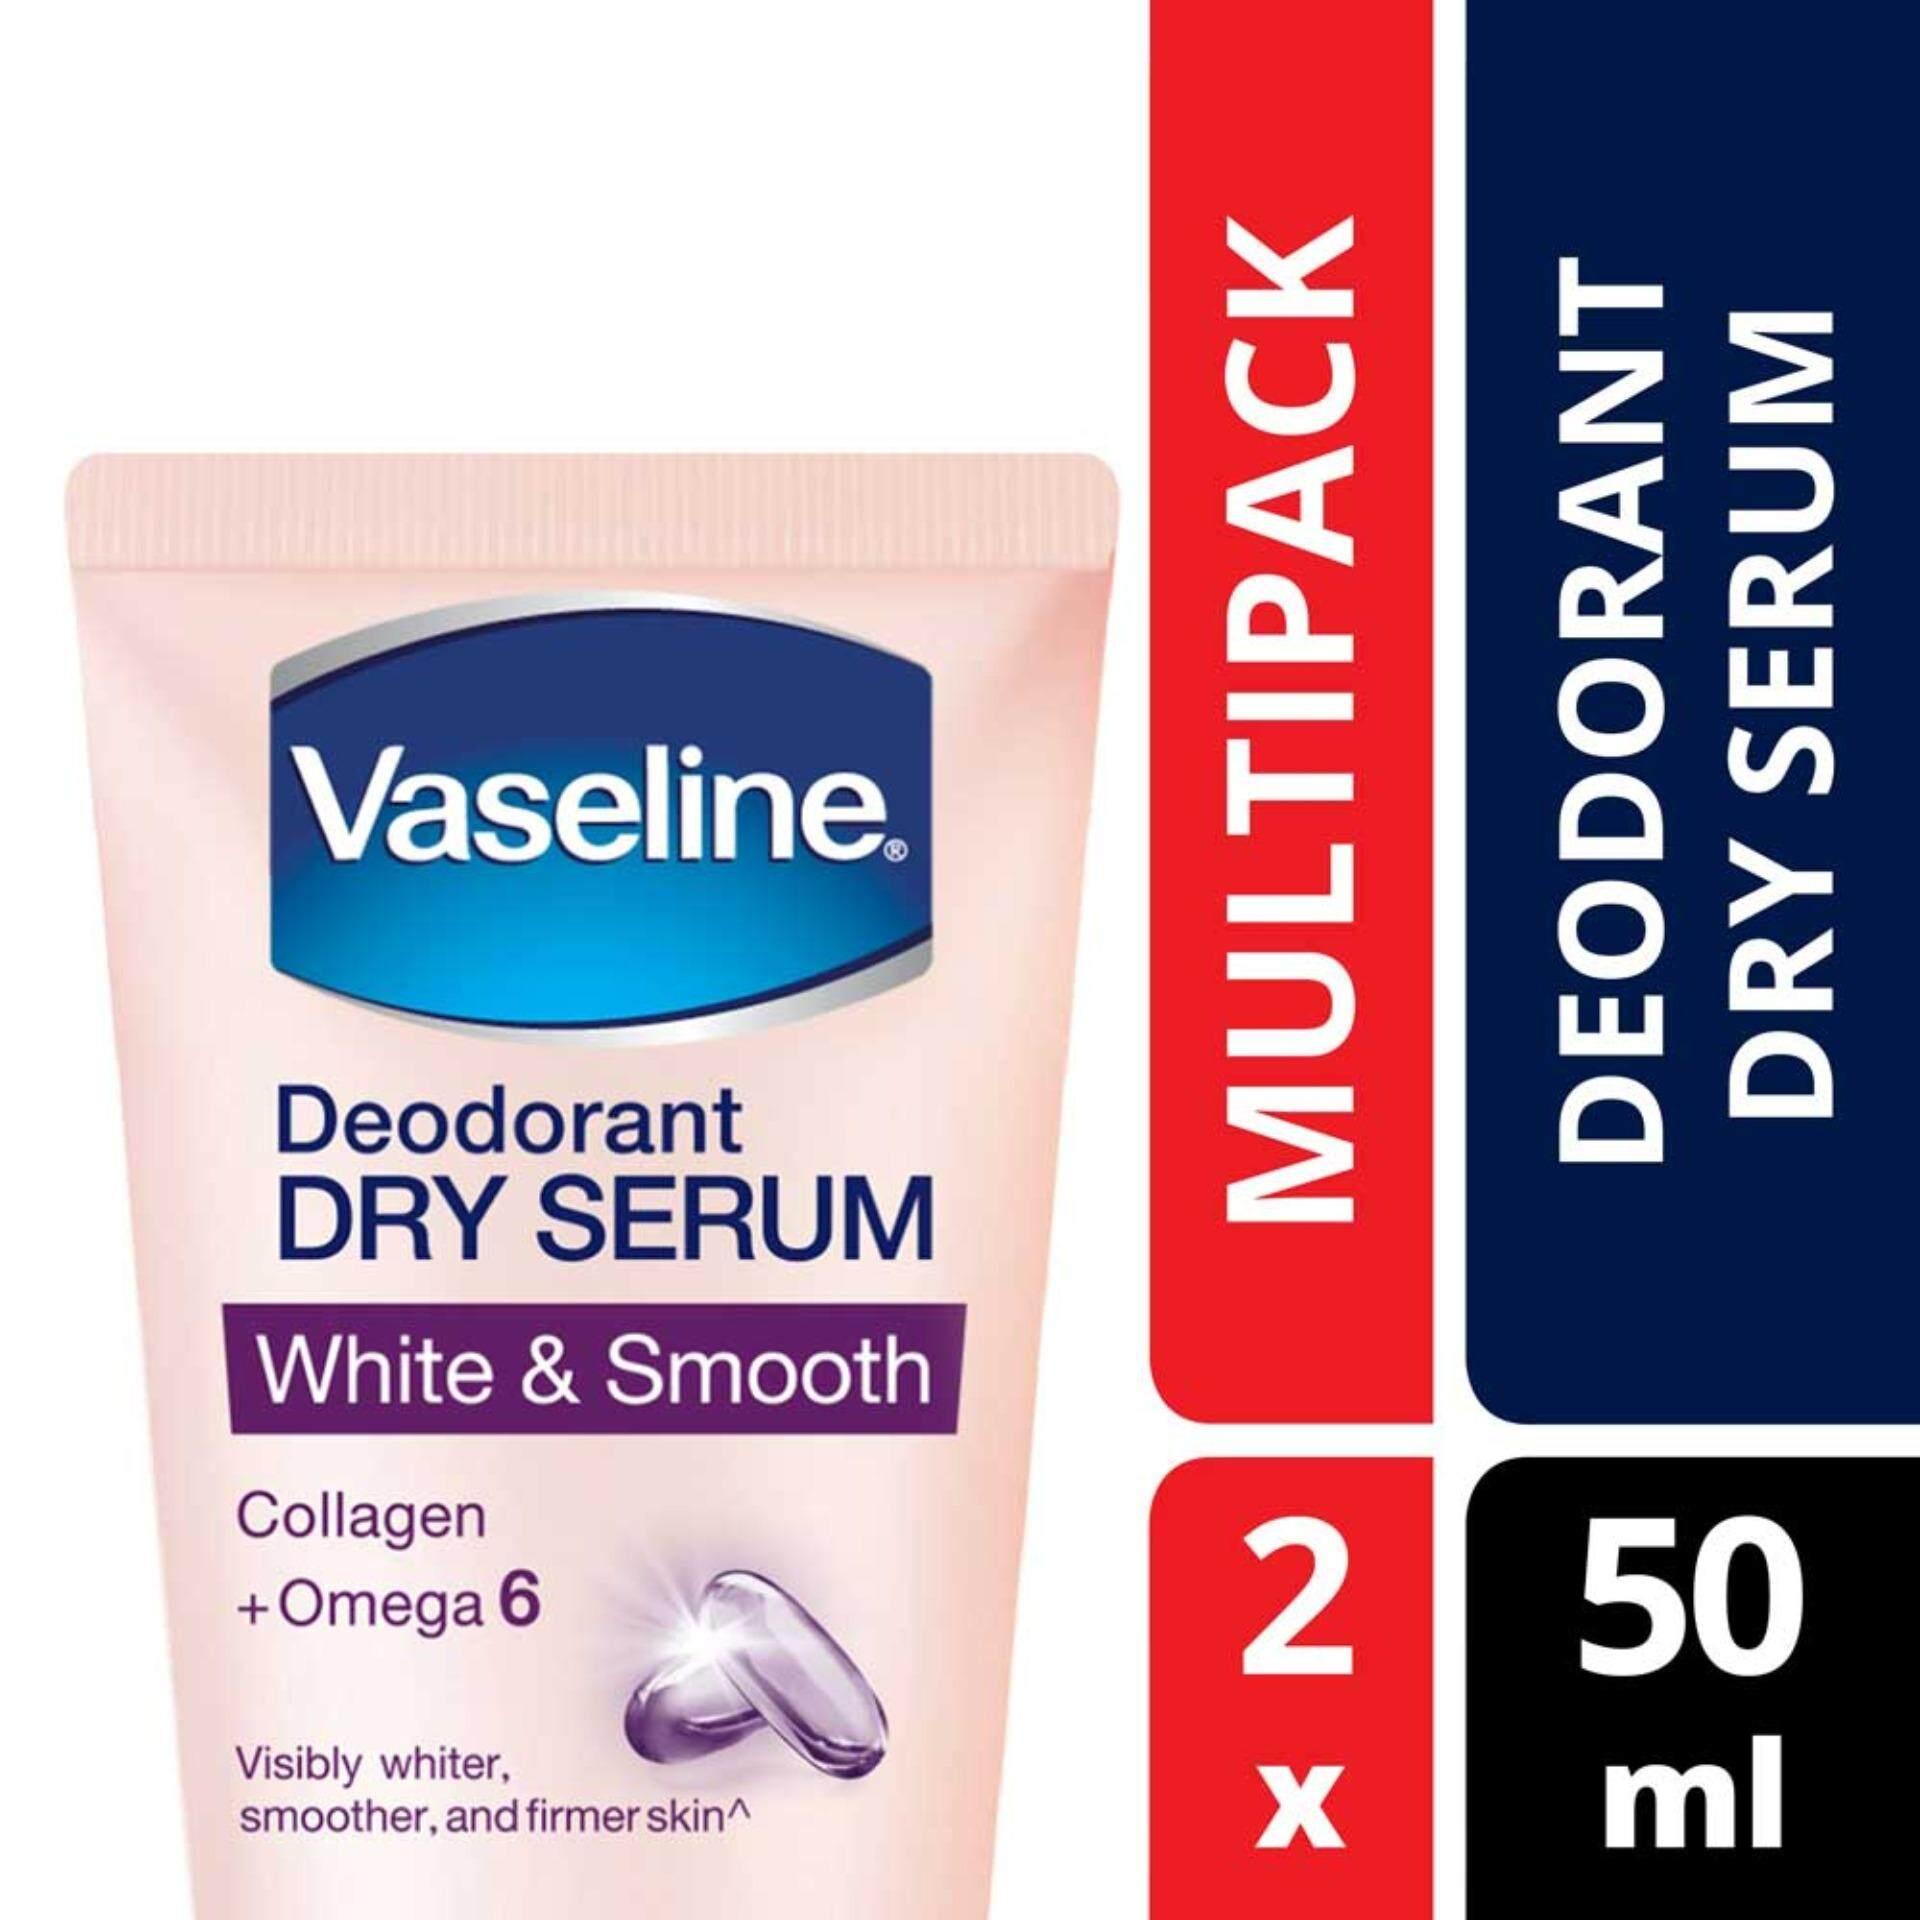 Vaseline Deodorant Dry Serum White & Smooth 50 ml ...